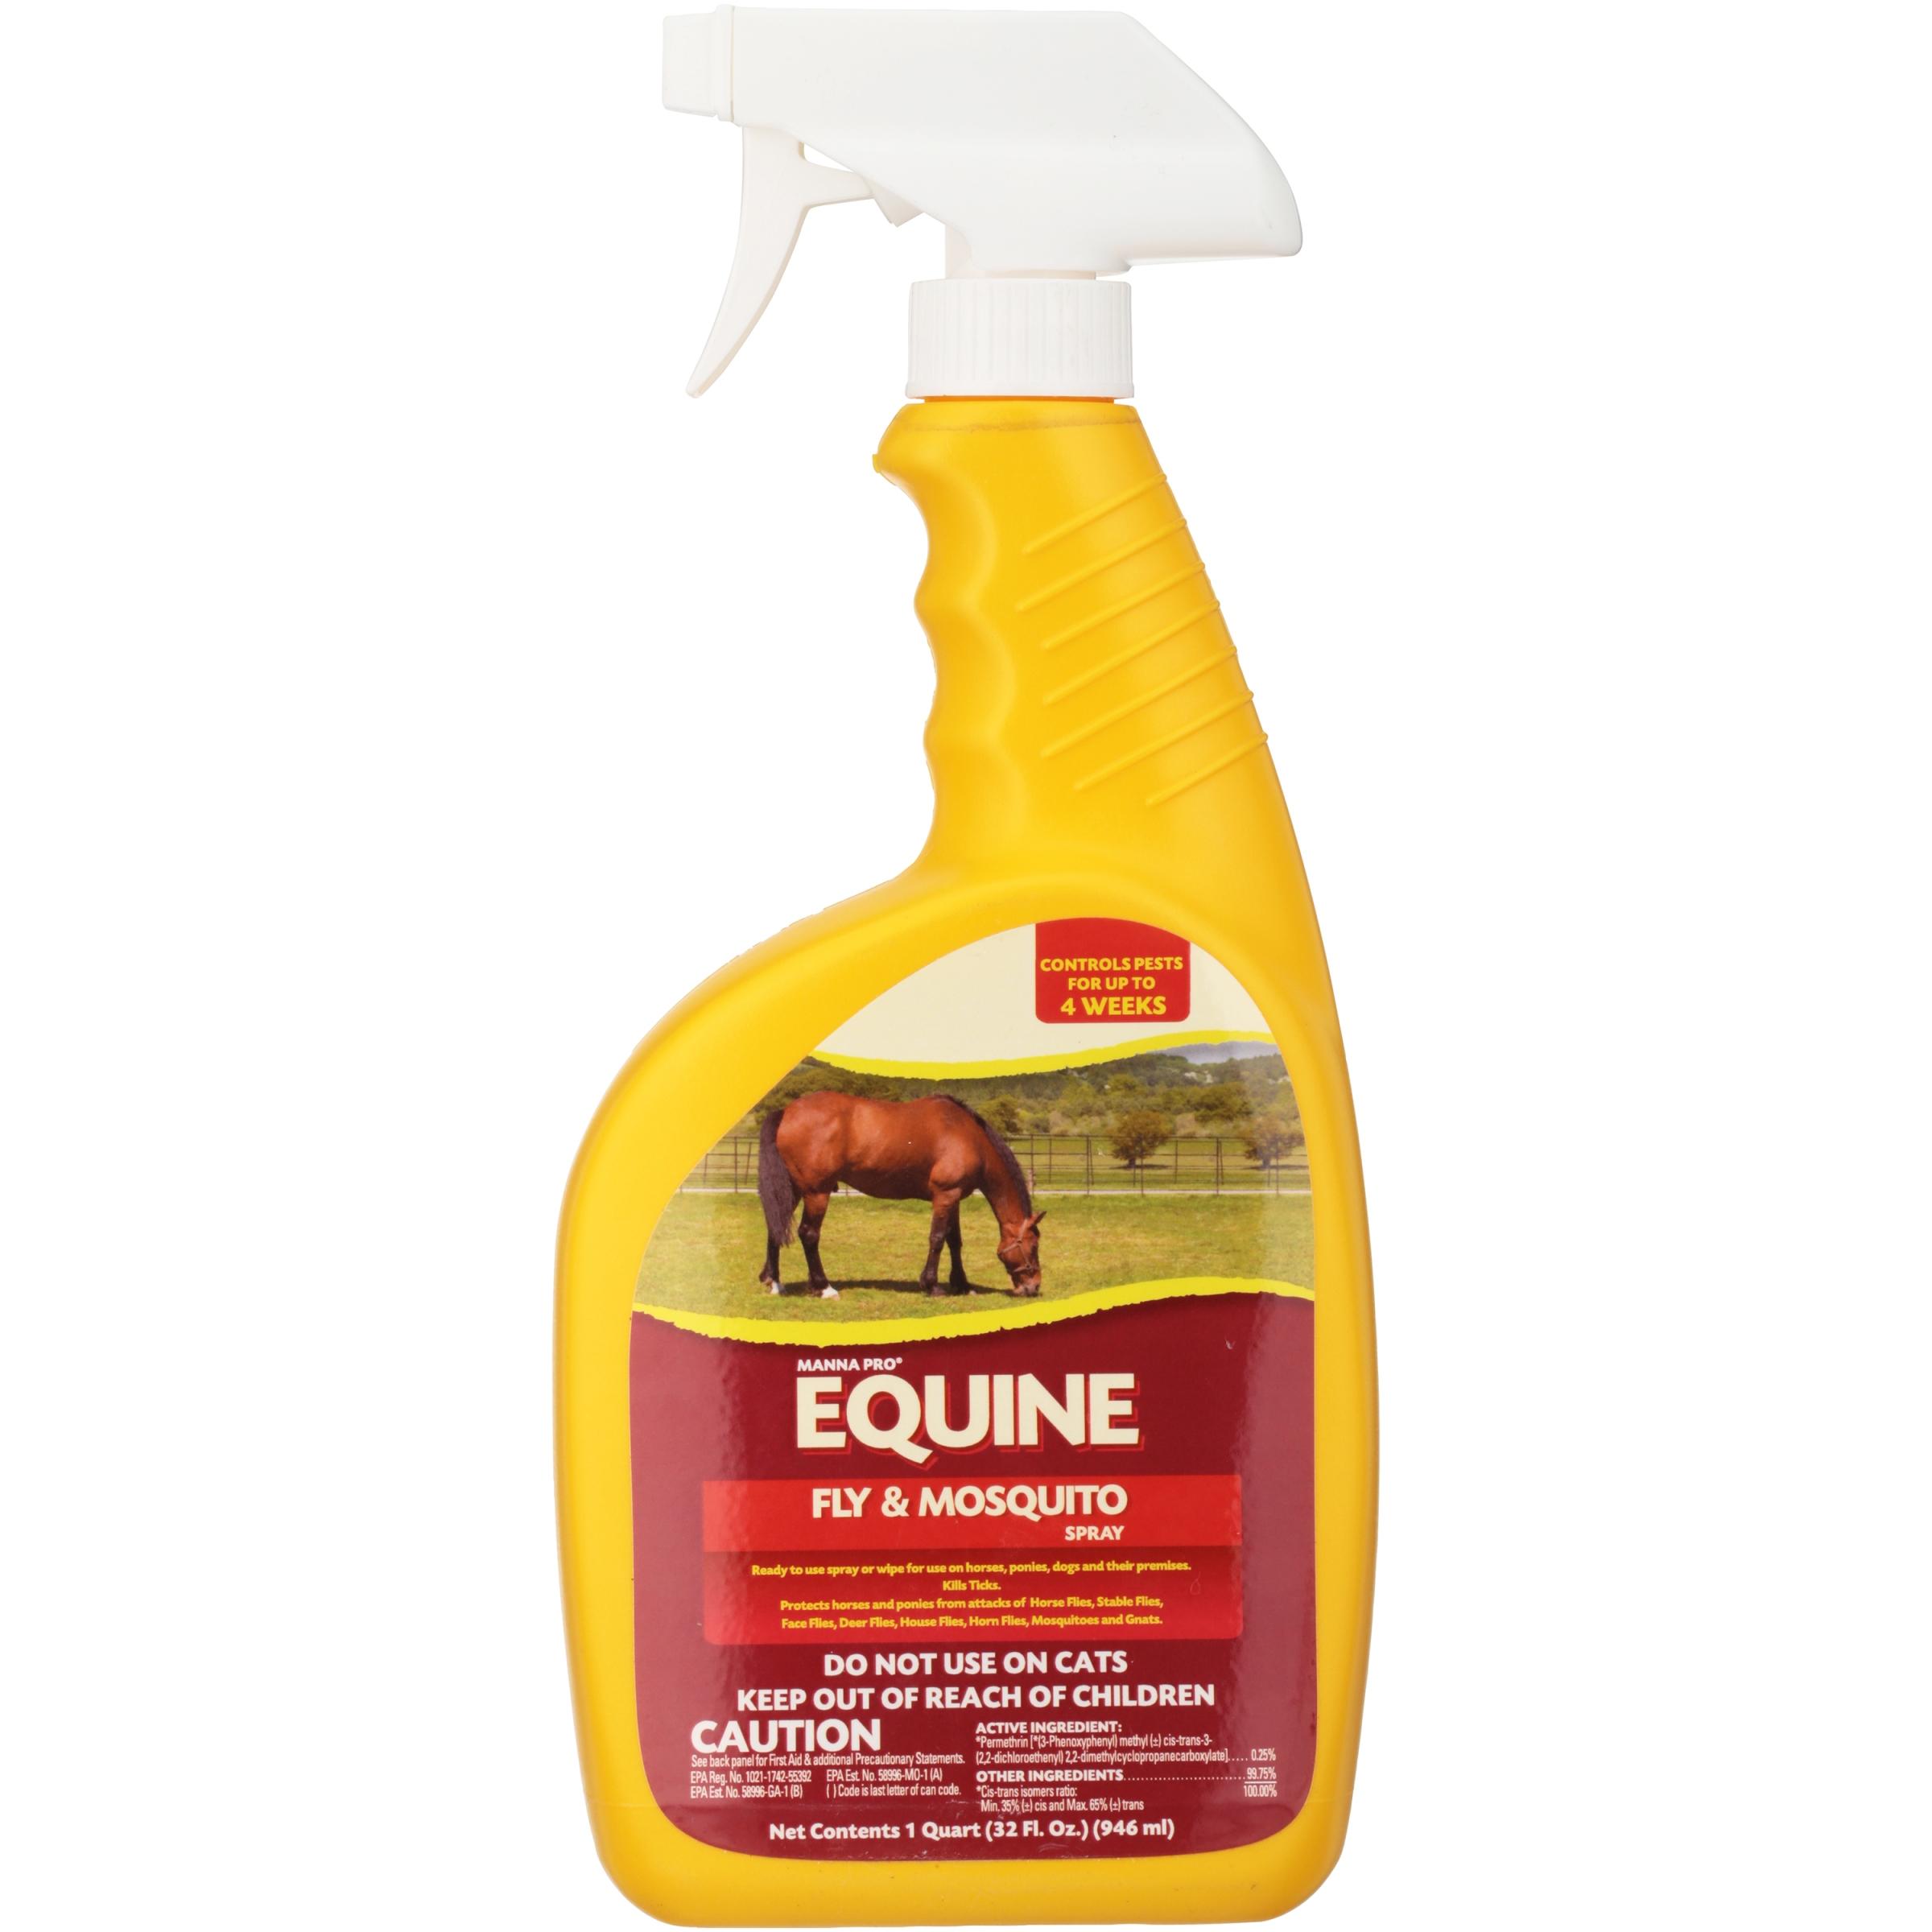 Manna Pro® Equine Fly & Mosquito Spray 32 fl oz Spray Bottle